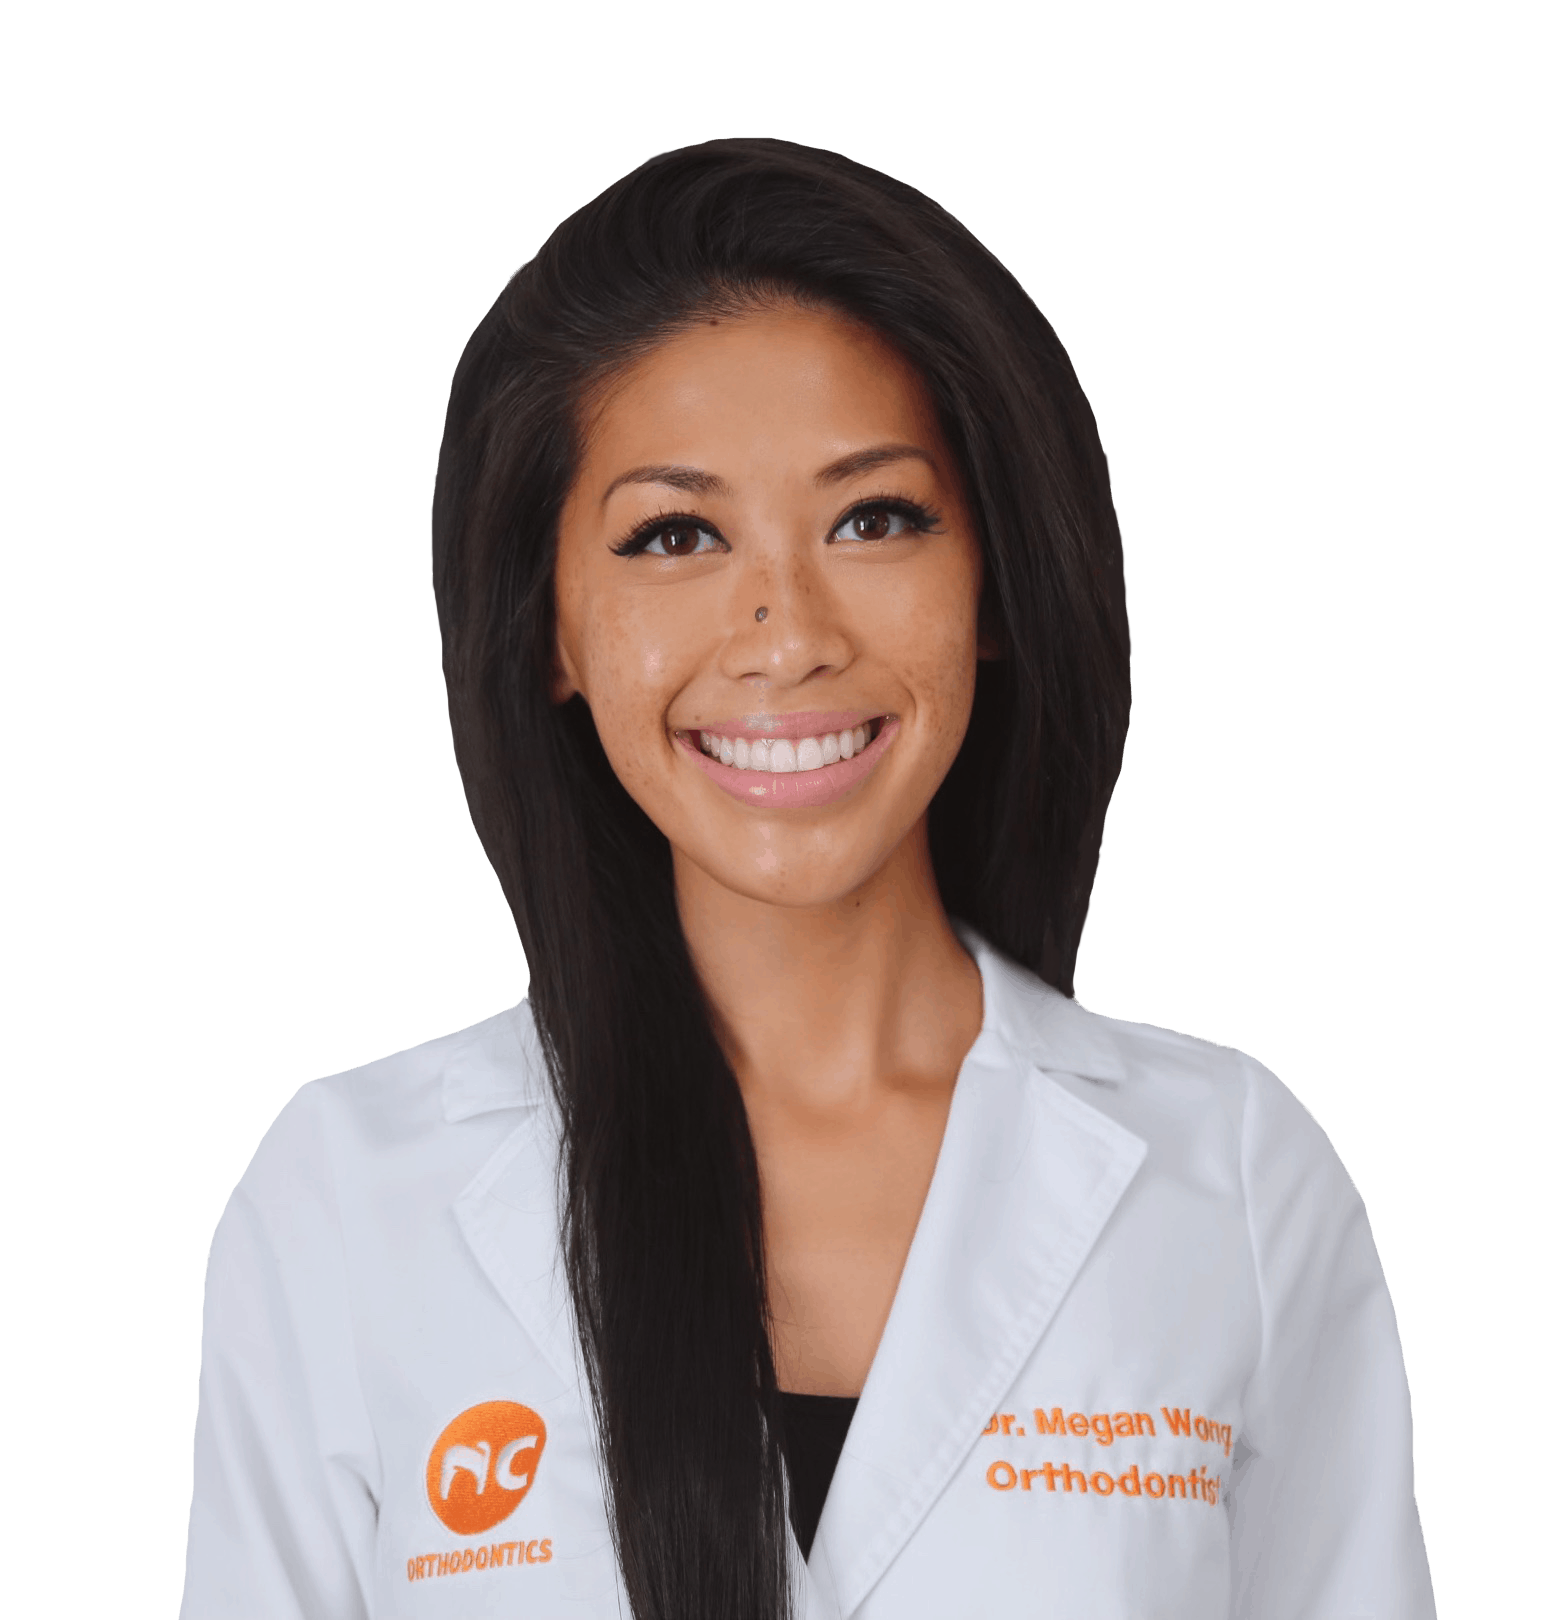 Orthodontist Megan Wong